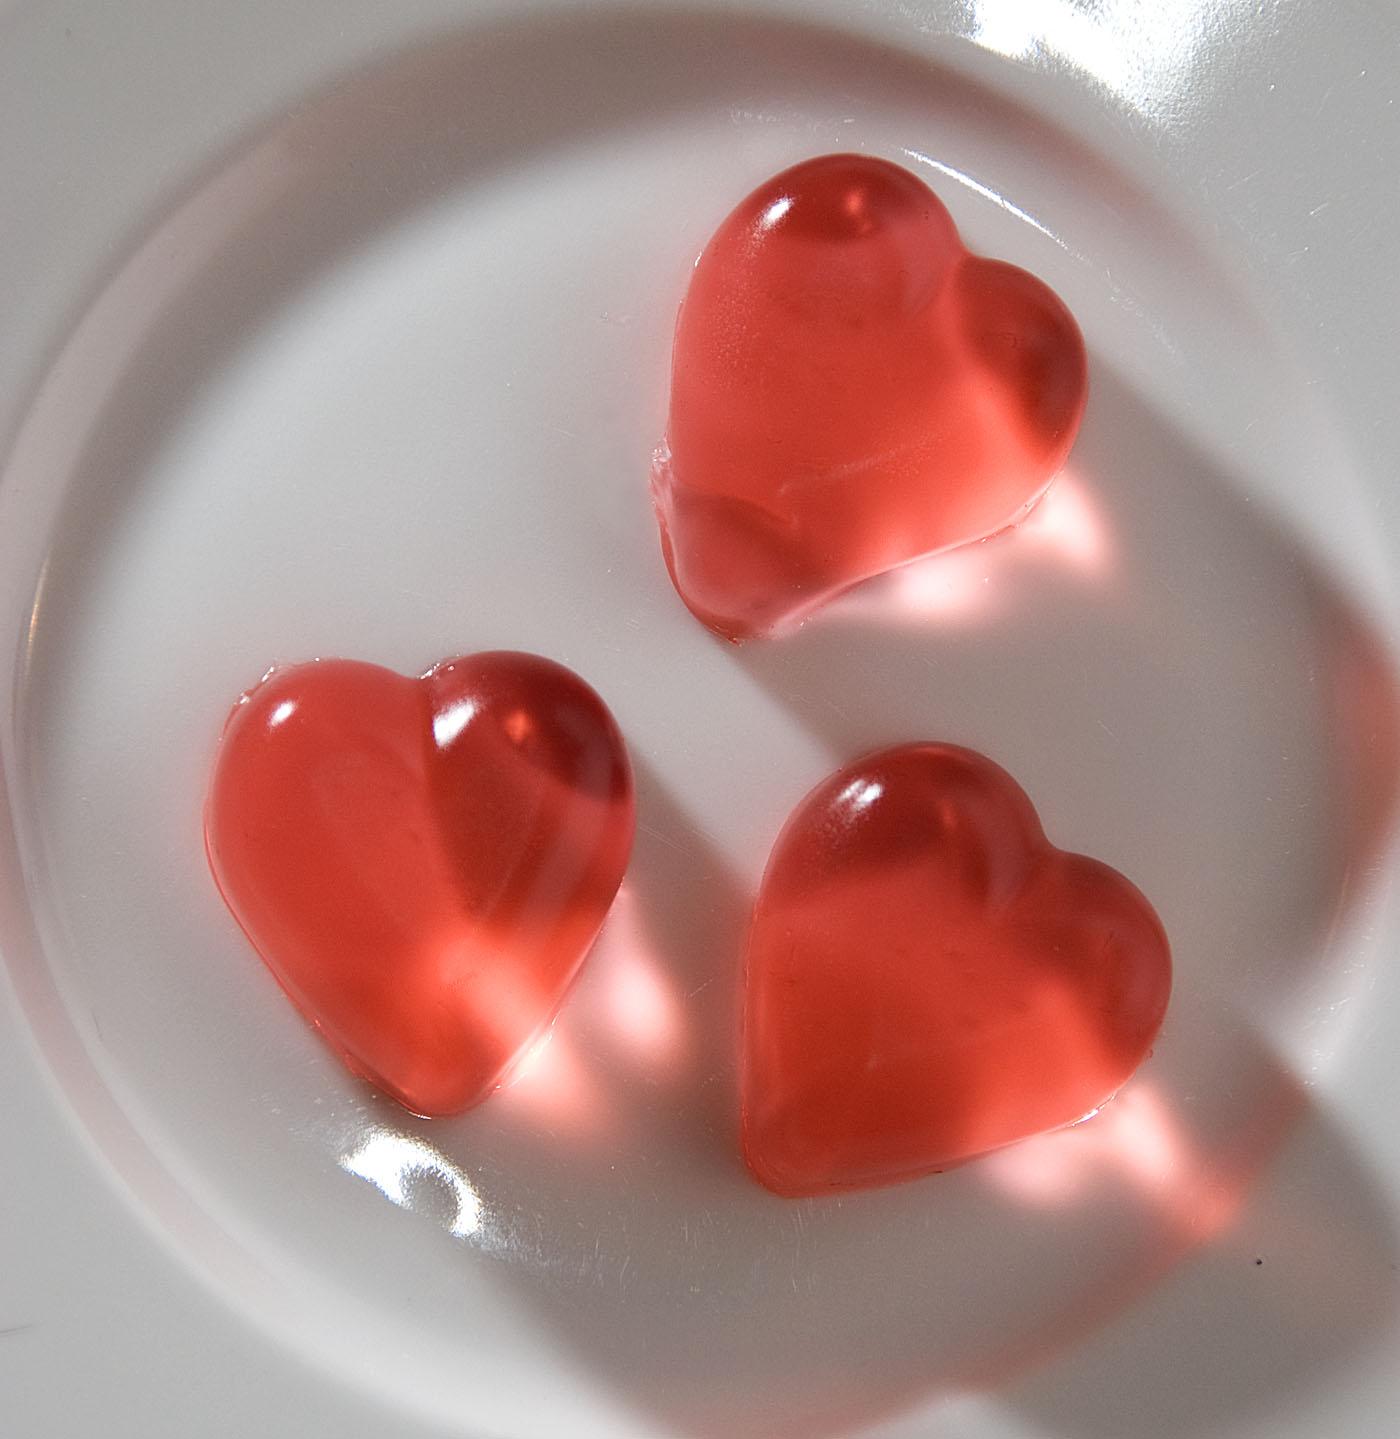 Skin-Friendly Jelly Soap